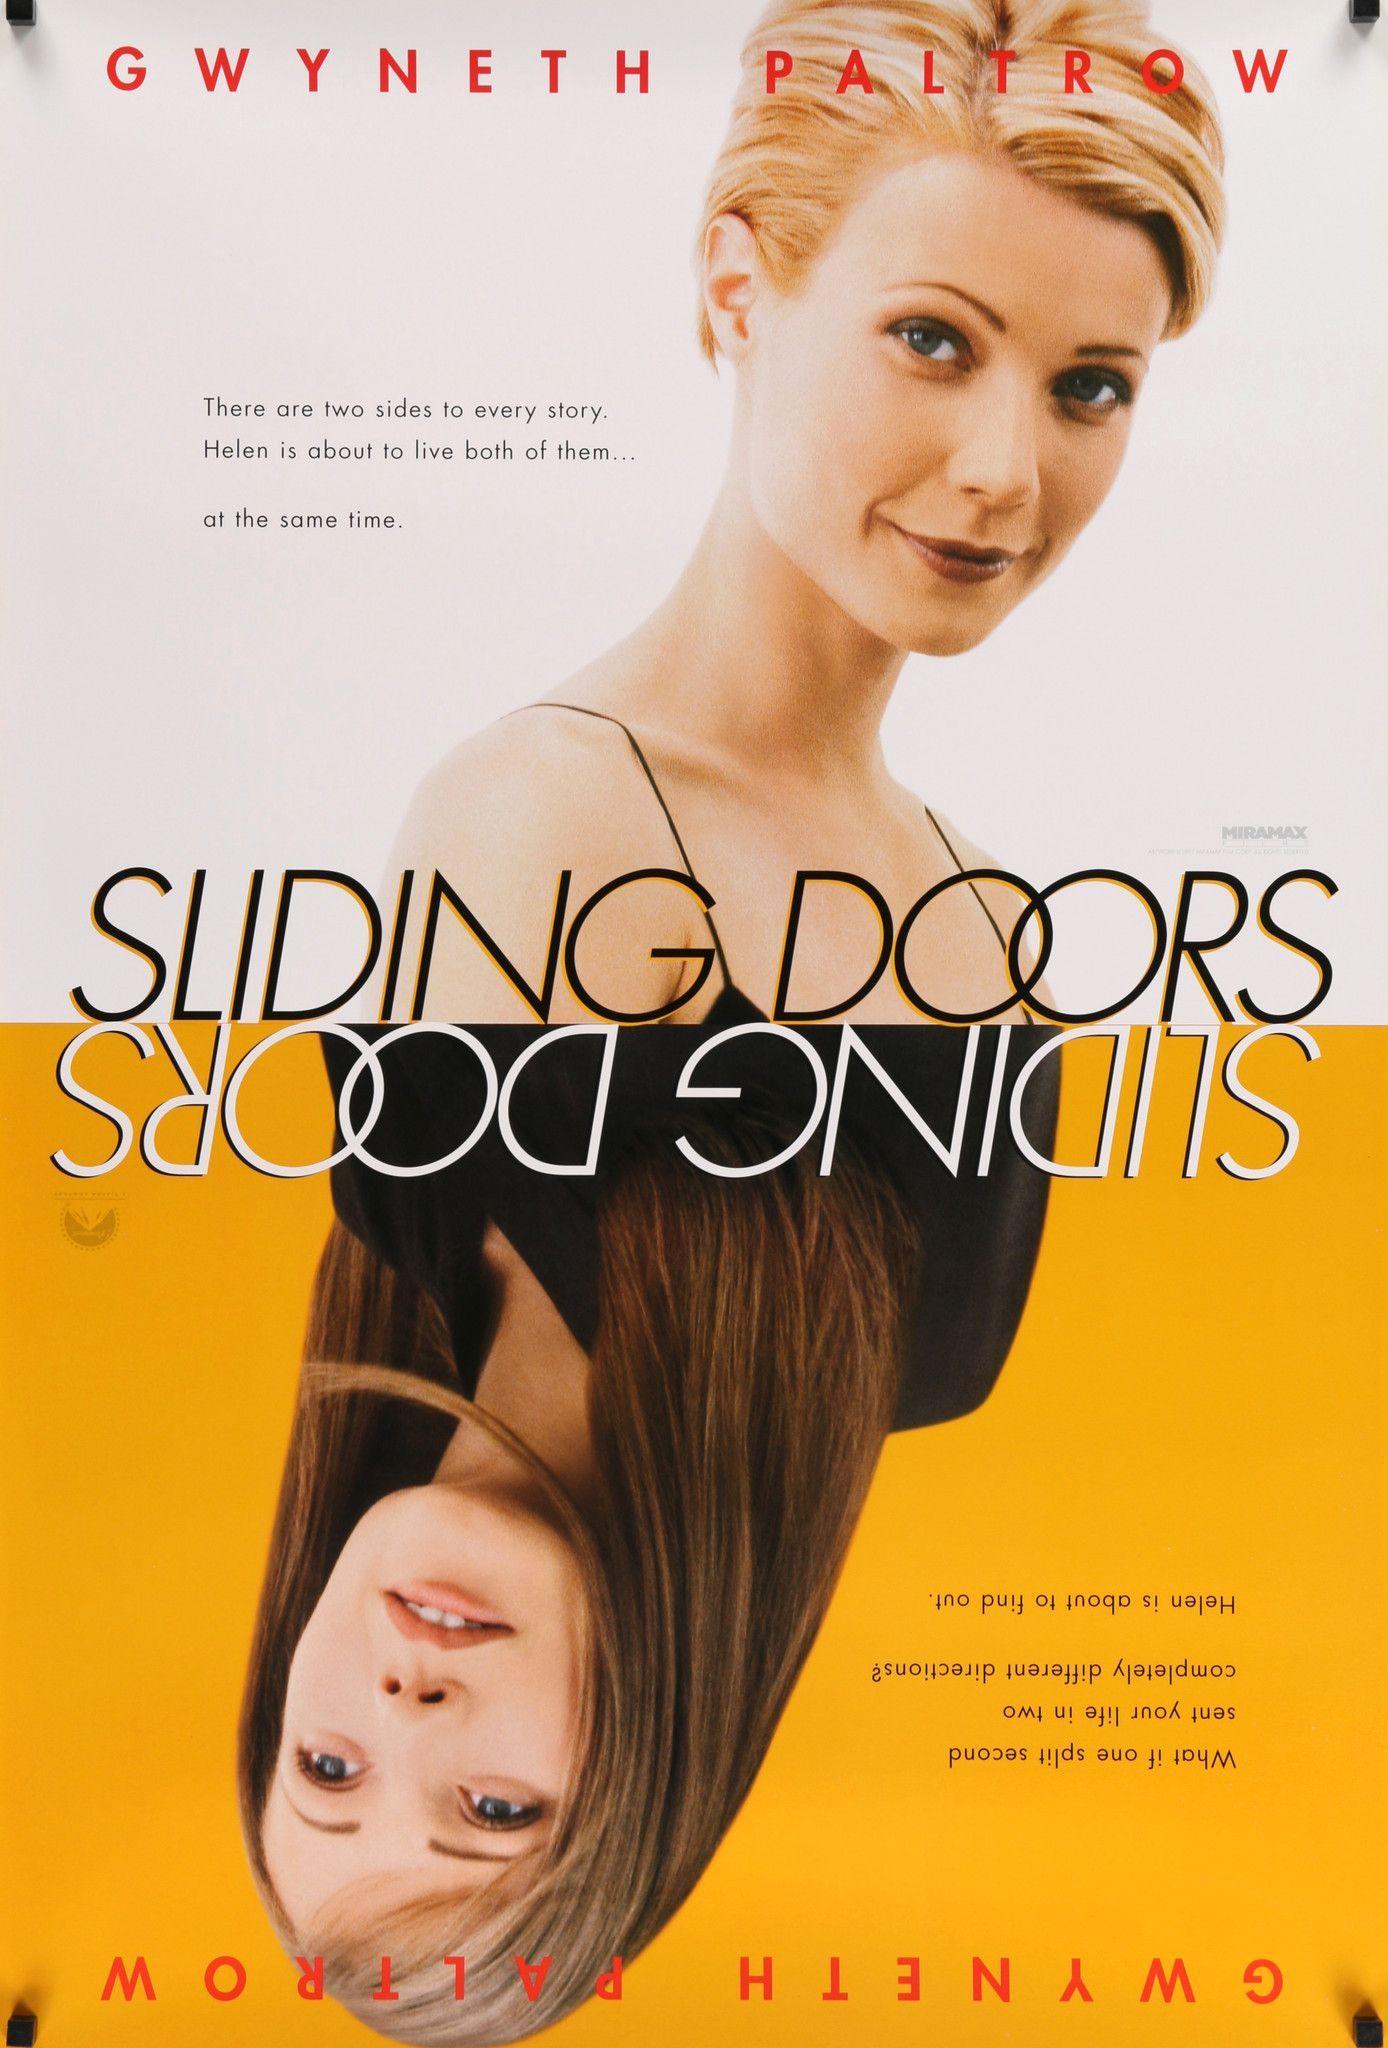 Sliding Doors 1998 Movie Posters At Original Film Art